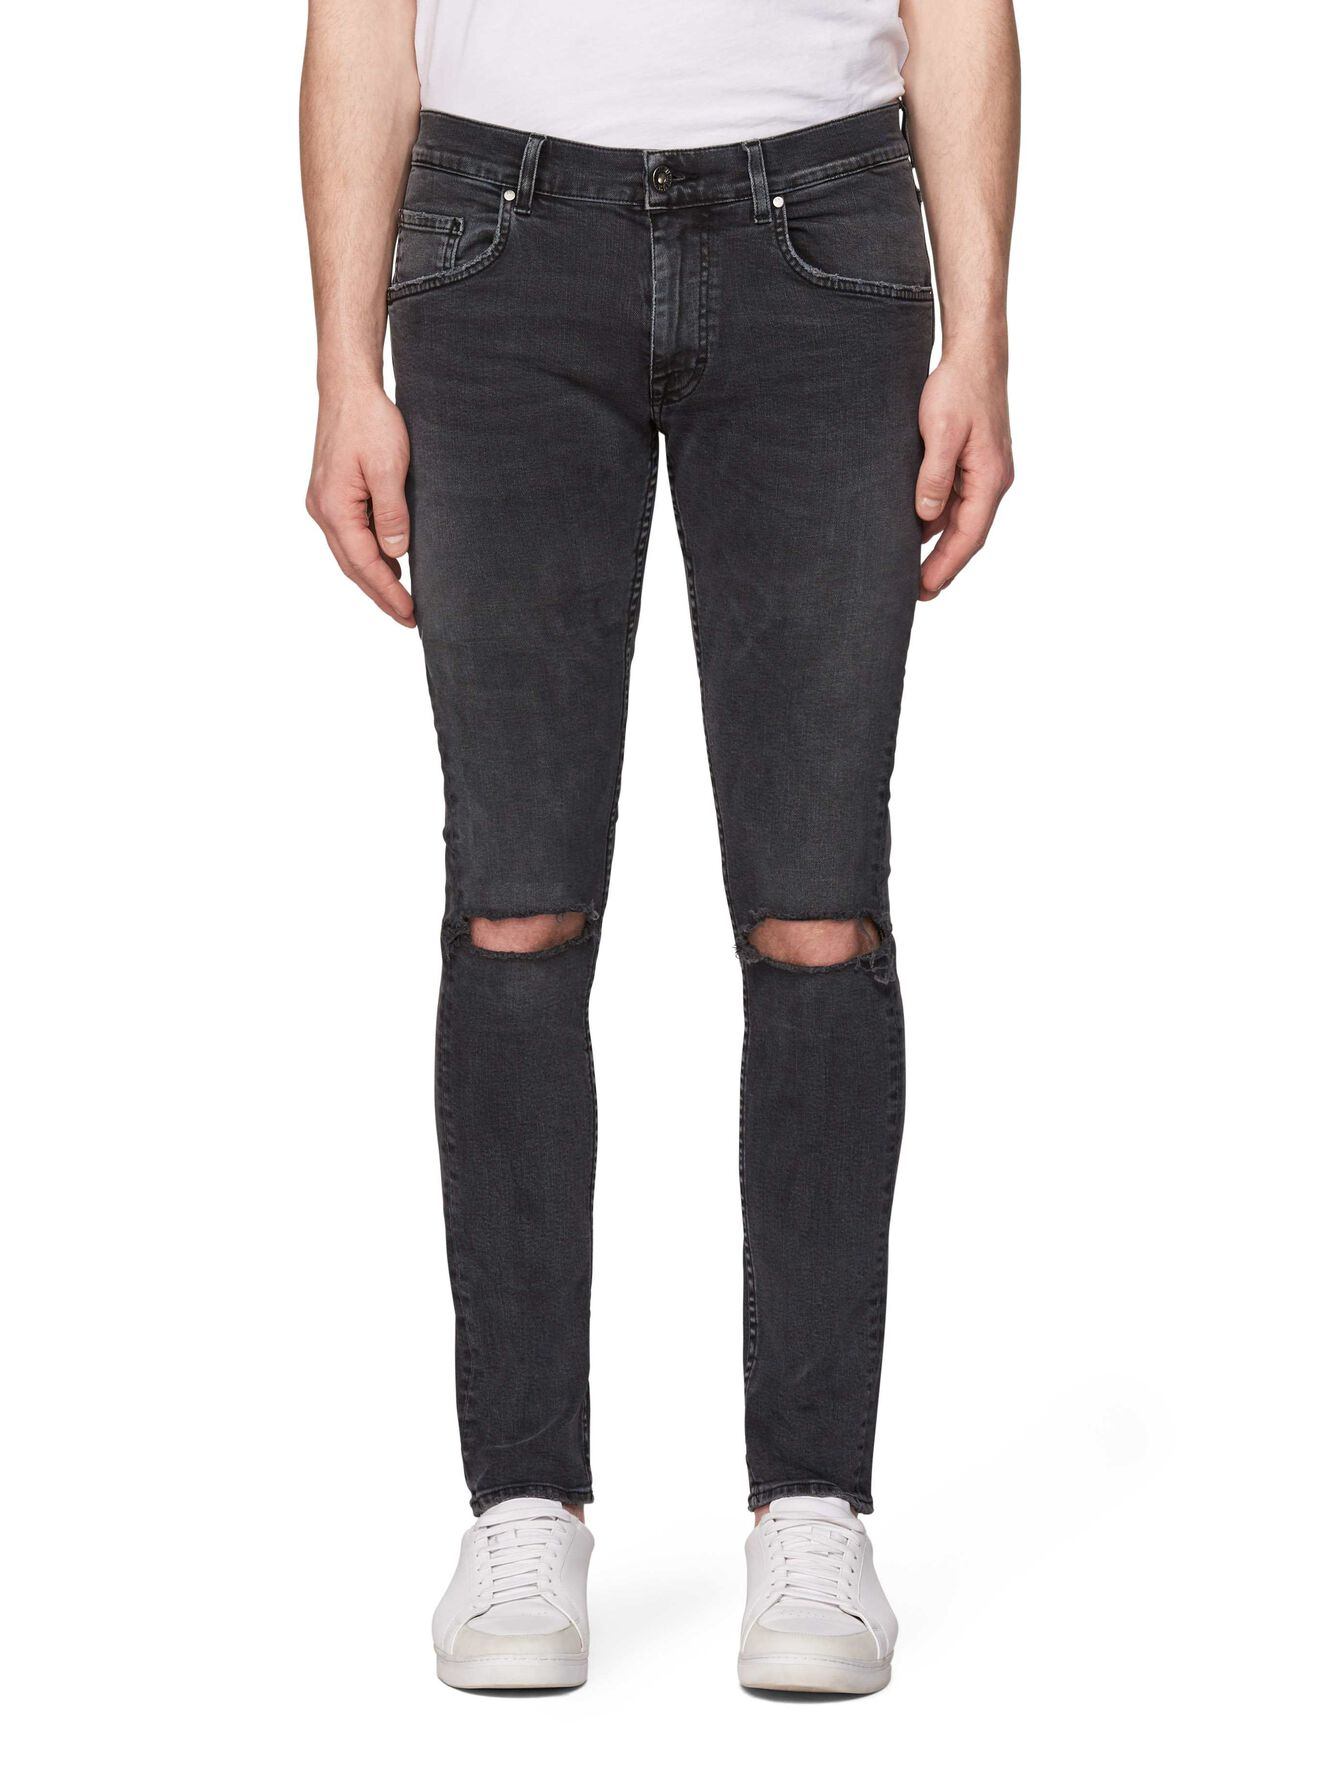 Slim Jeans in Black from Tiger of Sweden